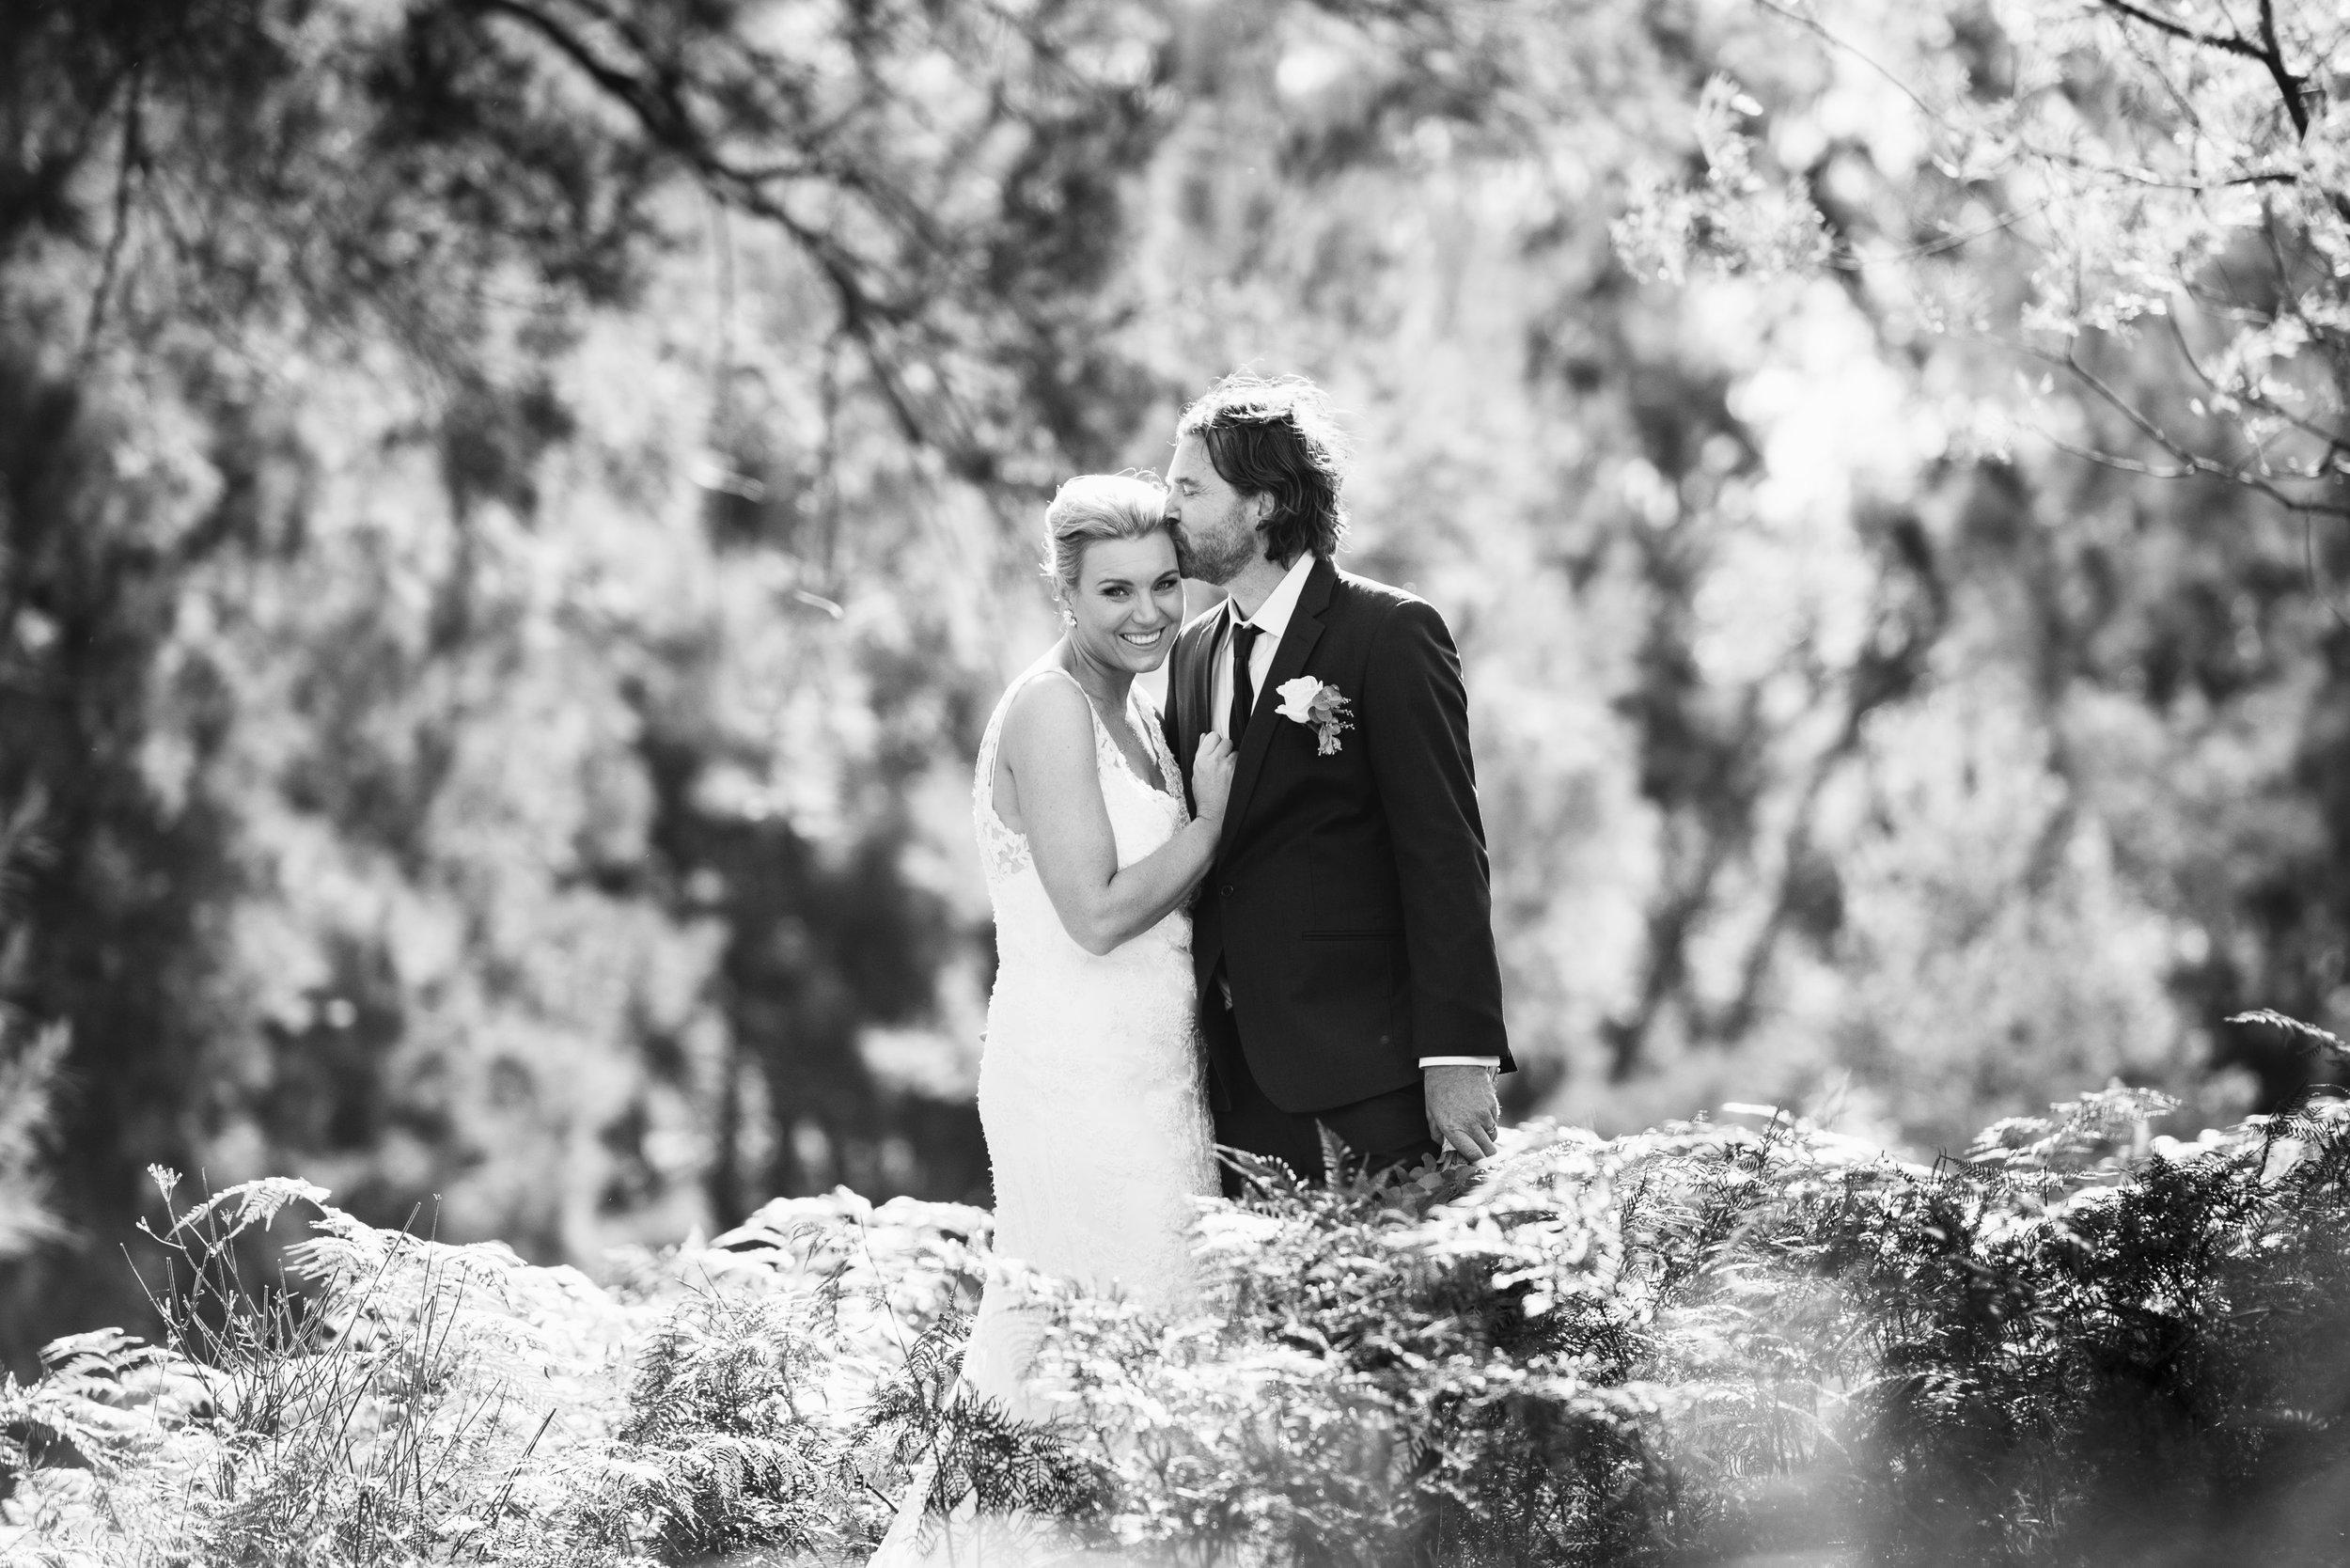 weddings by atelier photography-wedding-13.jpg